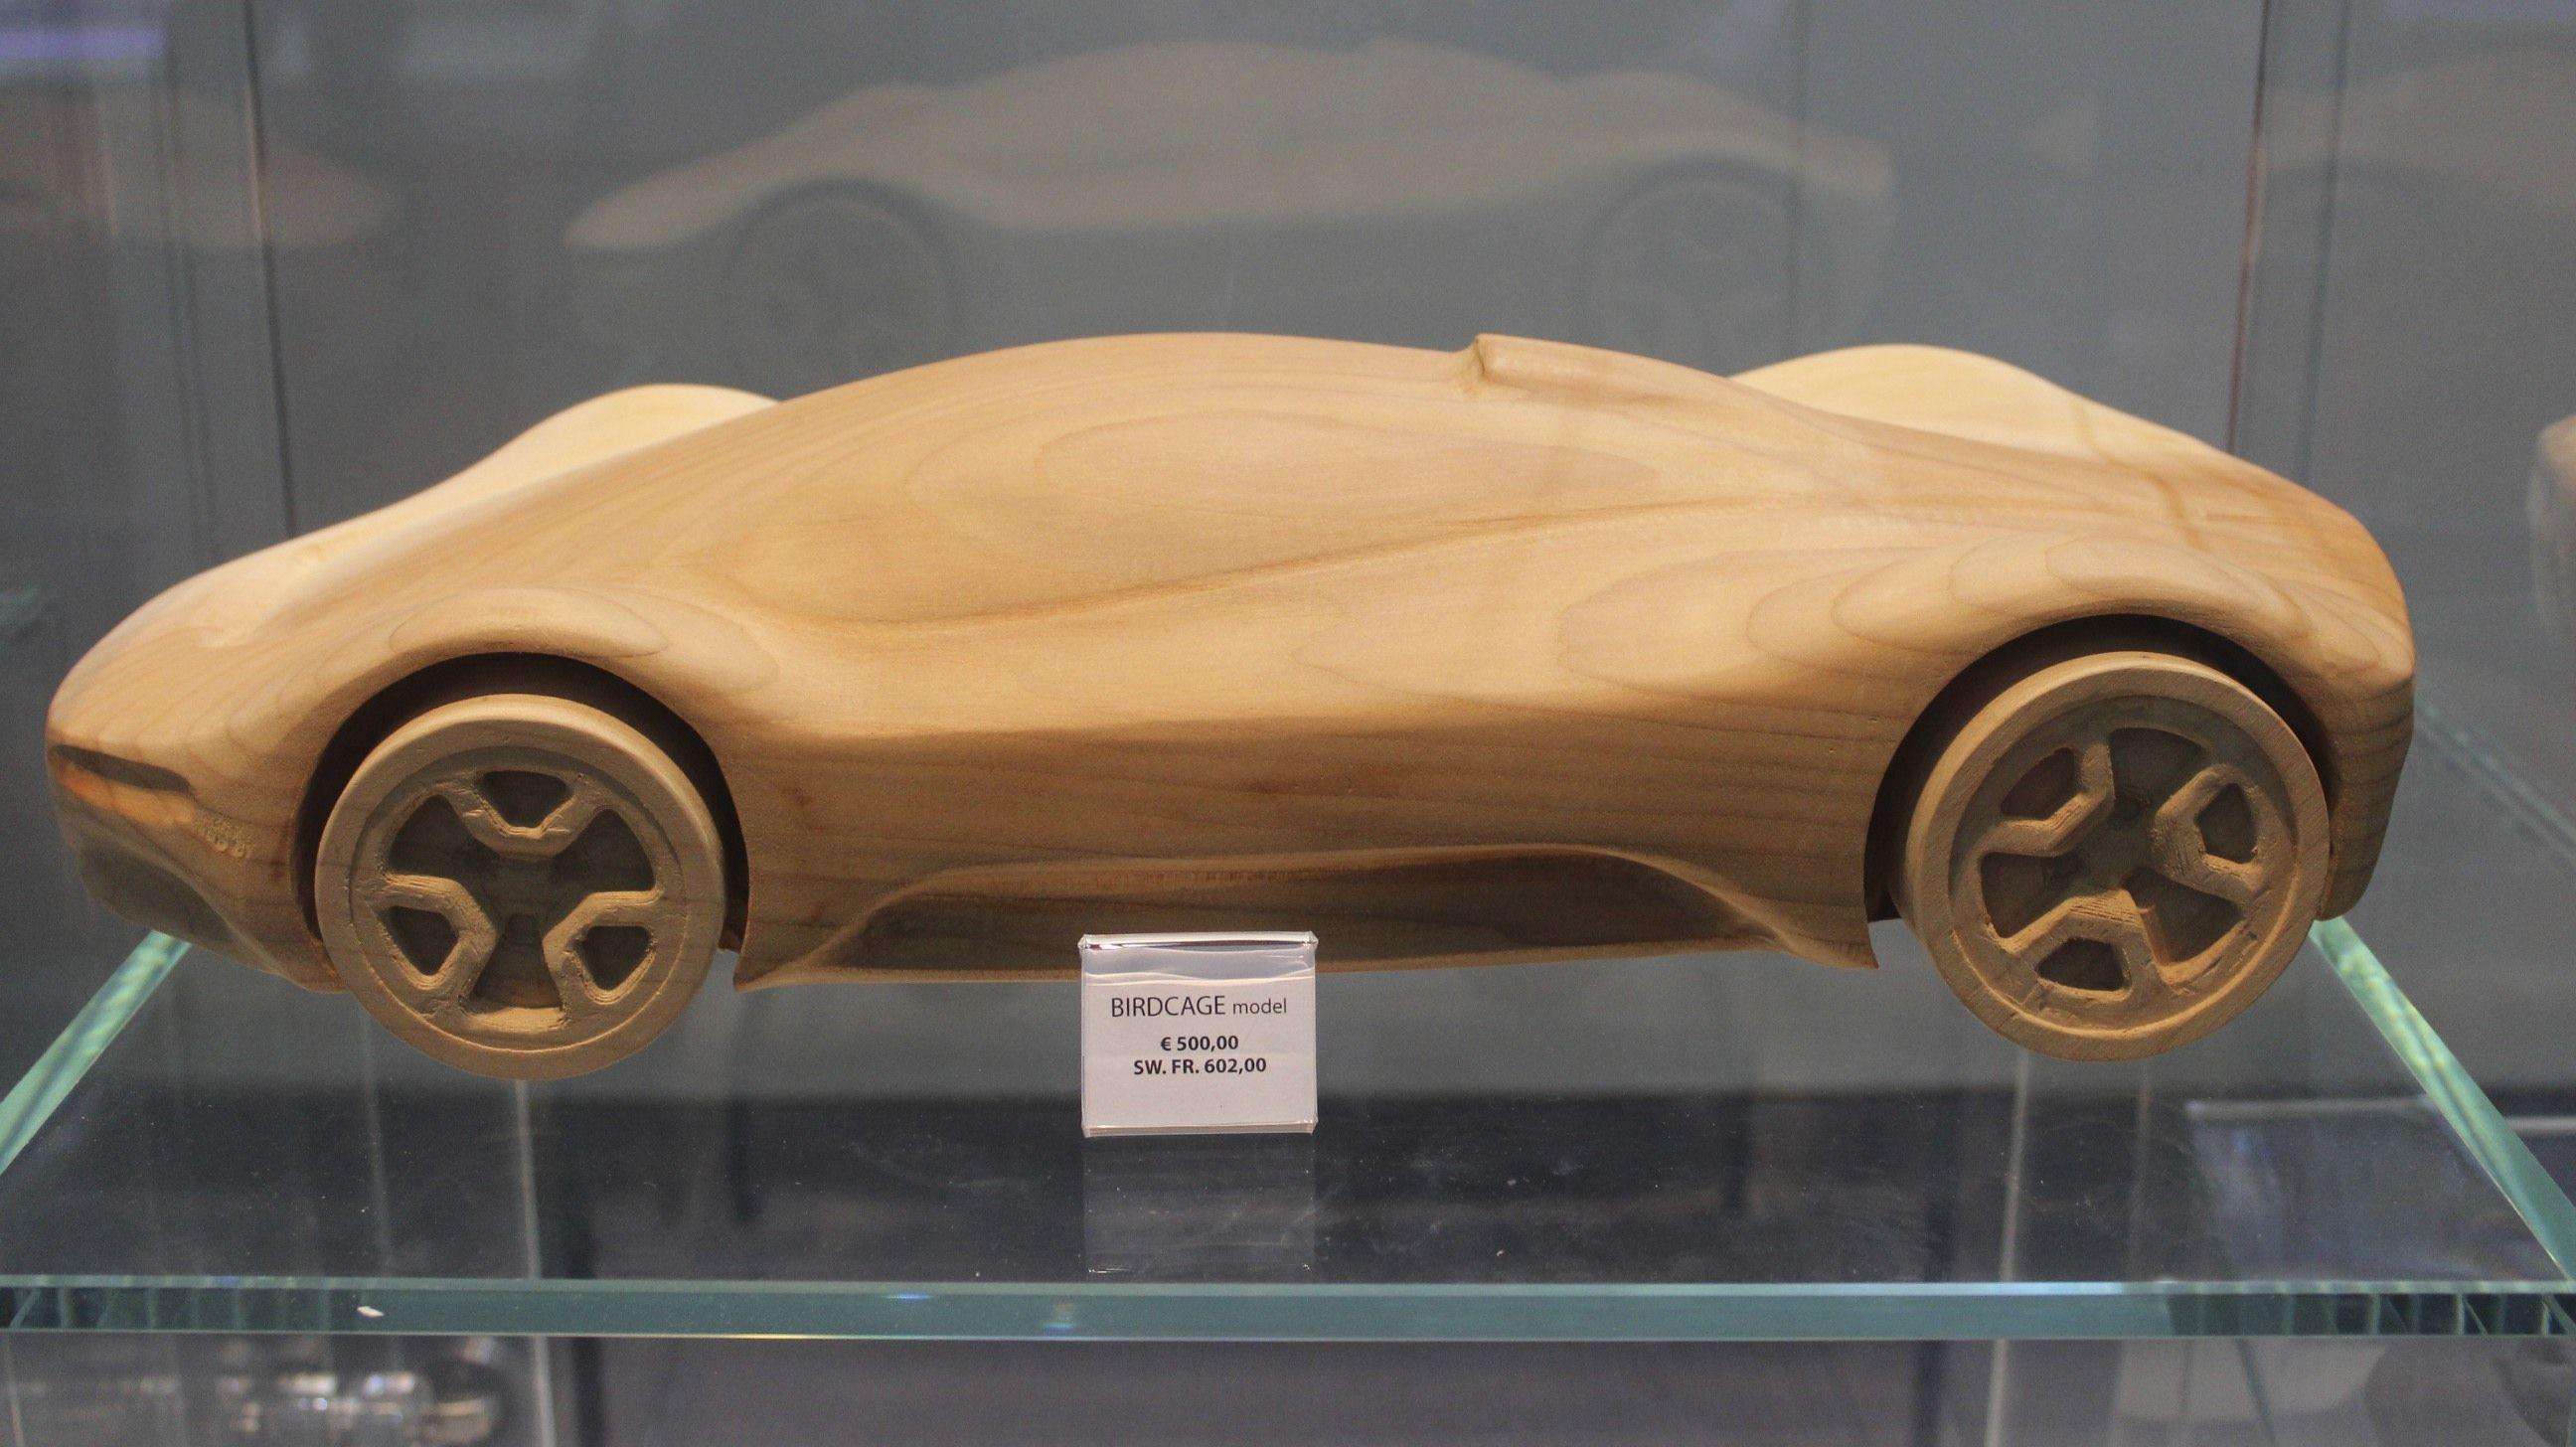 Design of a car pdf - Download Wooden Model Car Designs Pdf Wooden Rocking Horse Plans